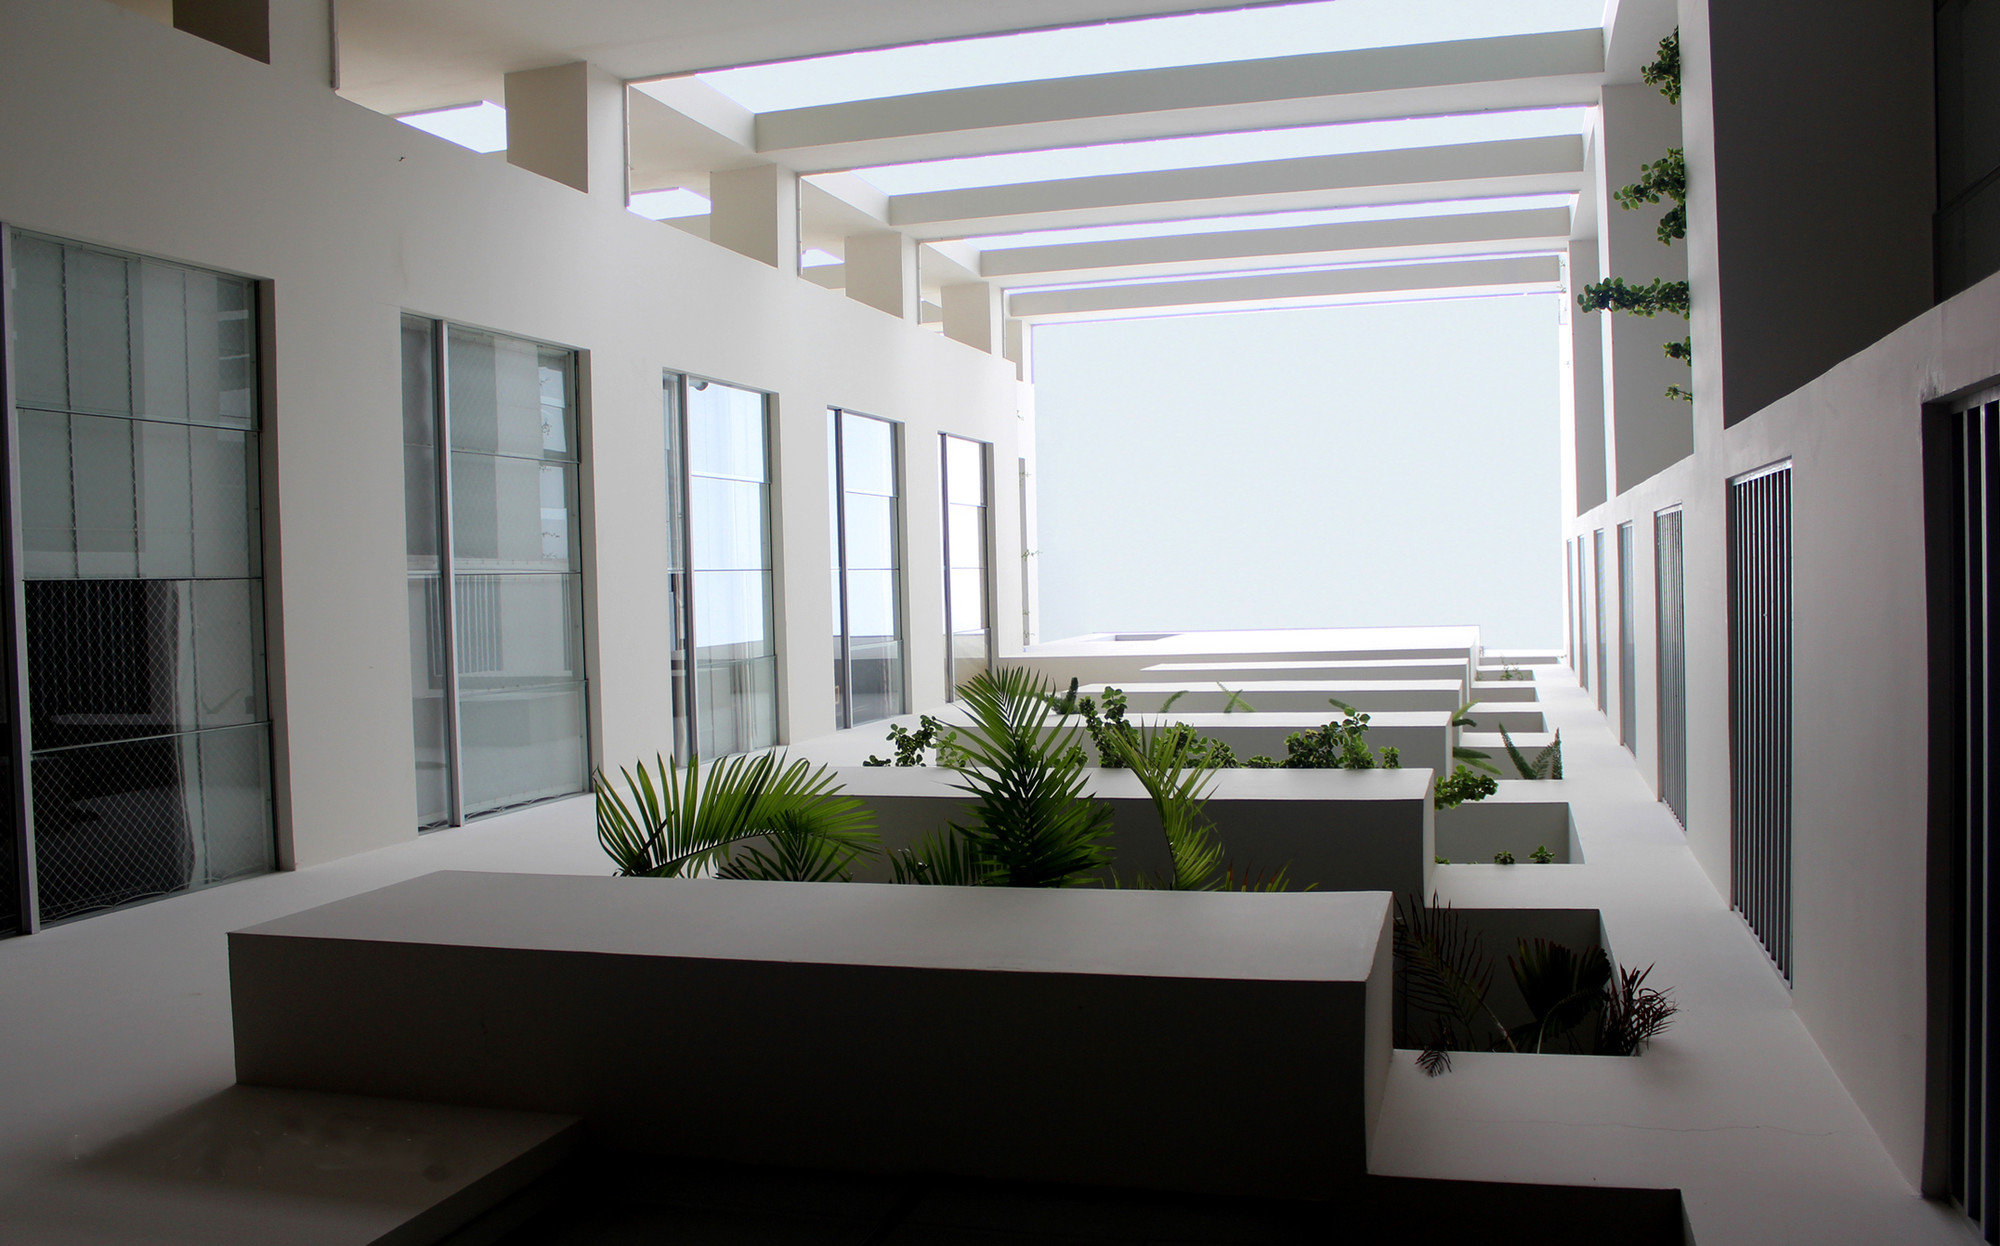 Edificio verona f v arquitectos archdaily colombia for Casas con patio interior